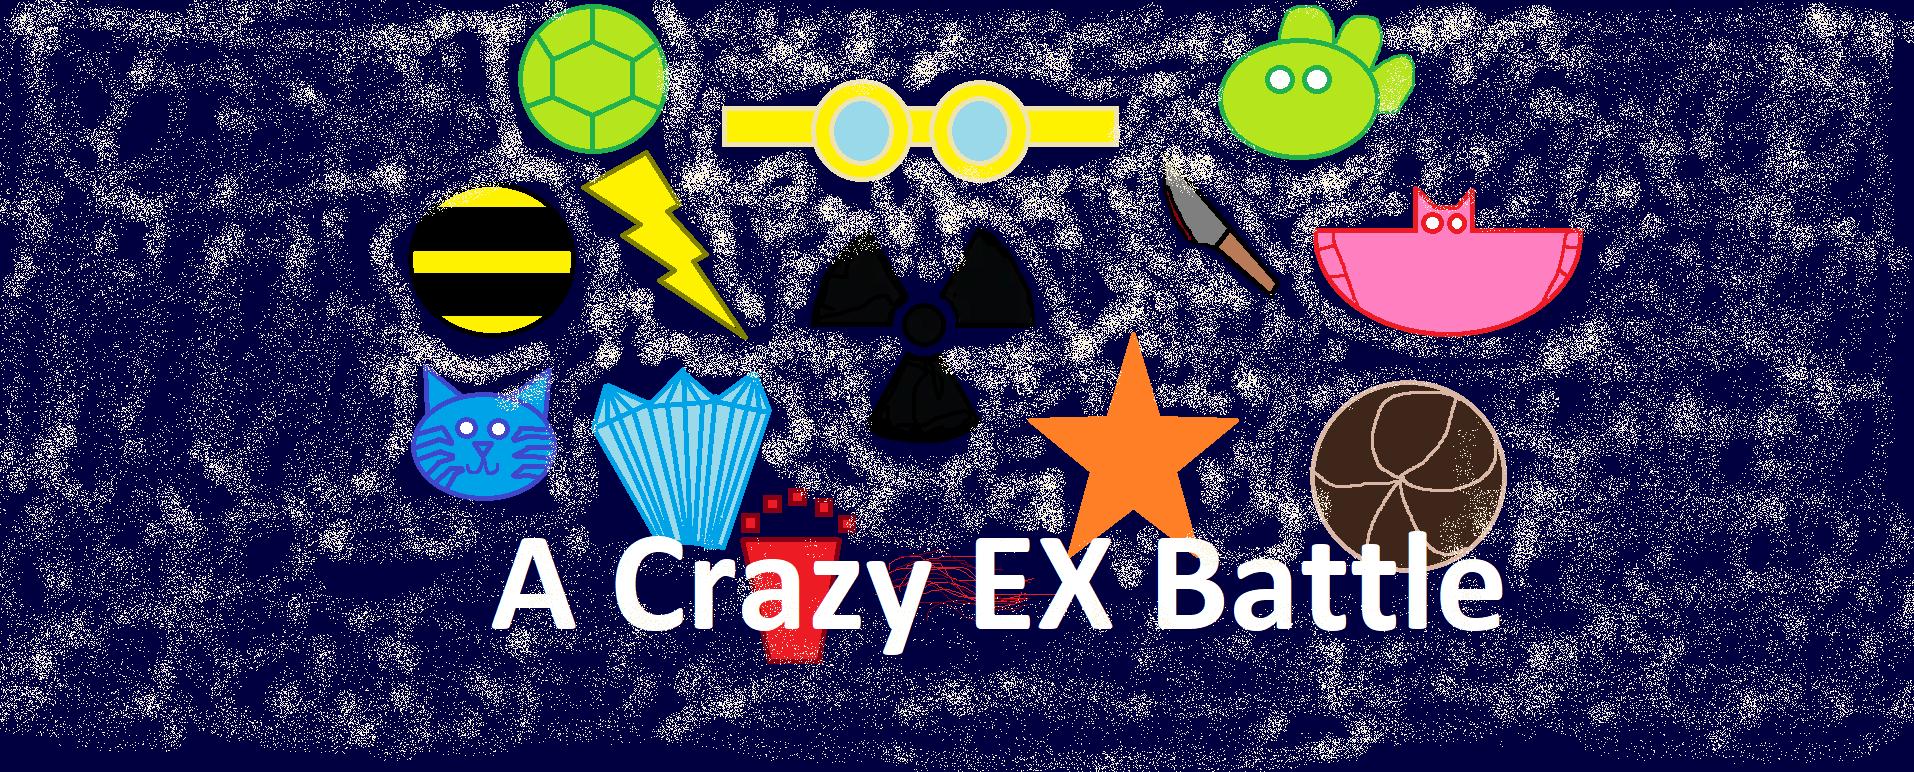 A Crazy EX Battle: The Movie